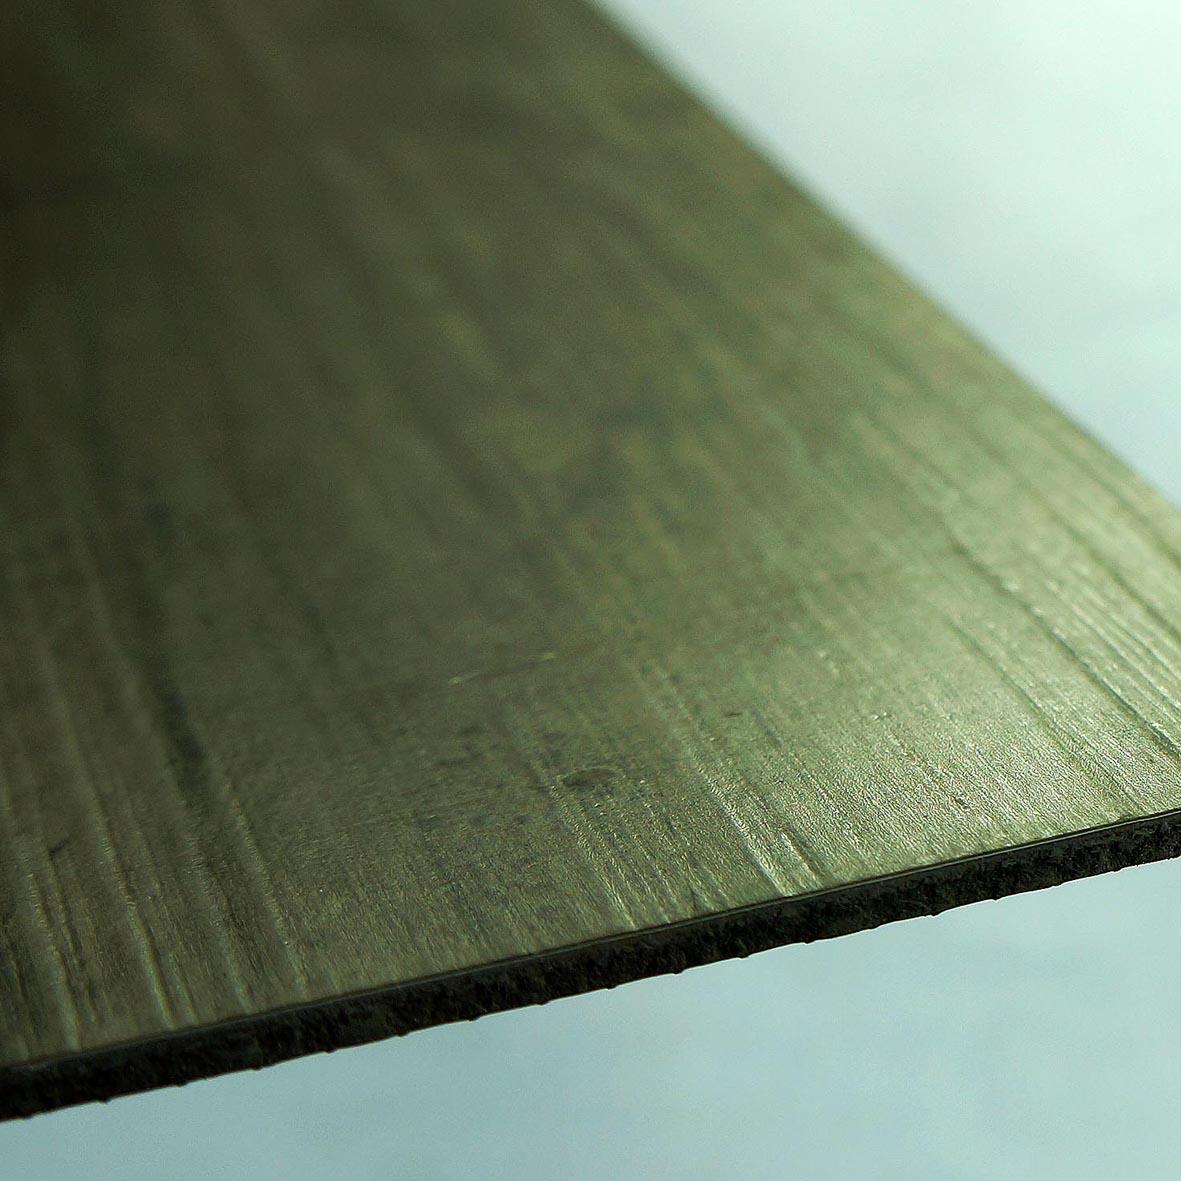 Non Slip Loose Lay Vinyl Flooring Topjoyflooring